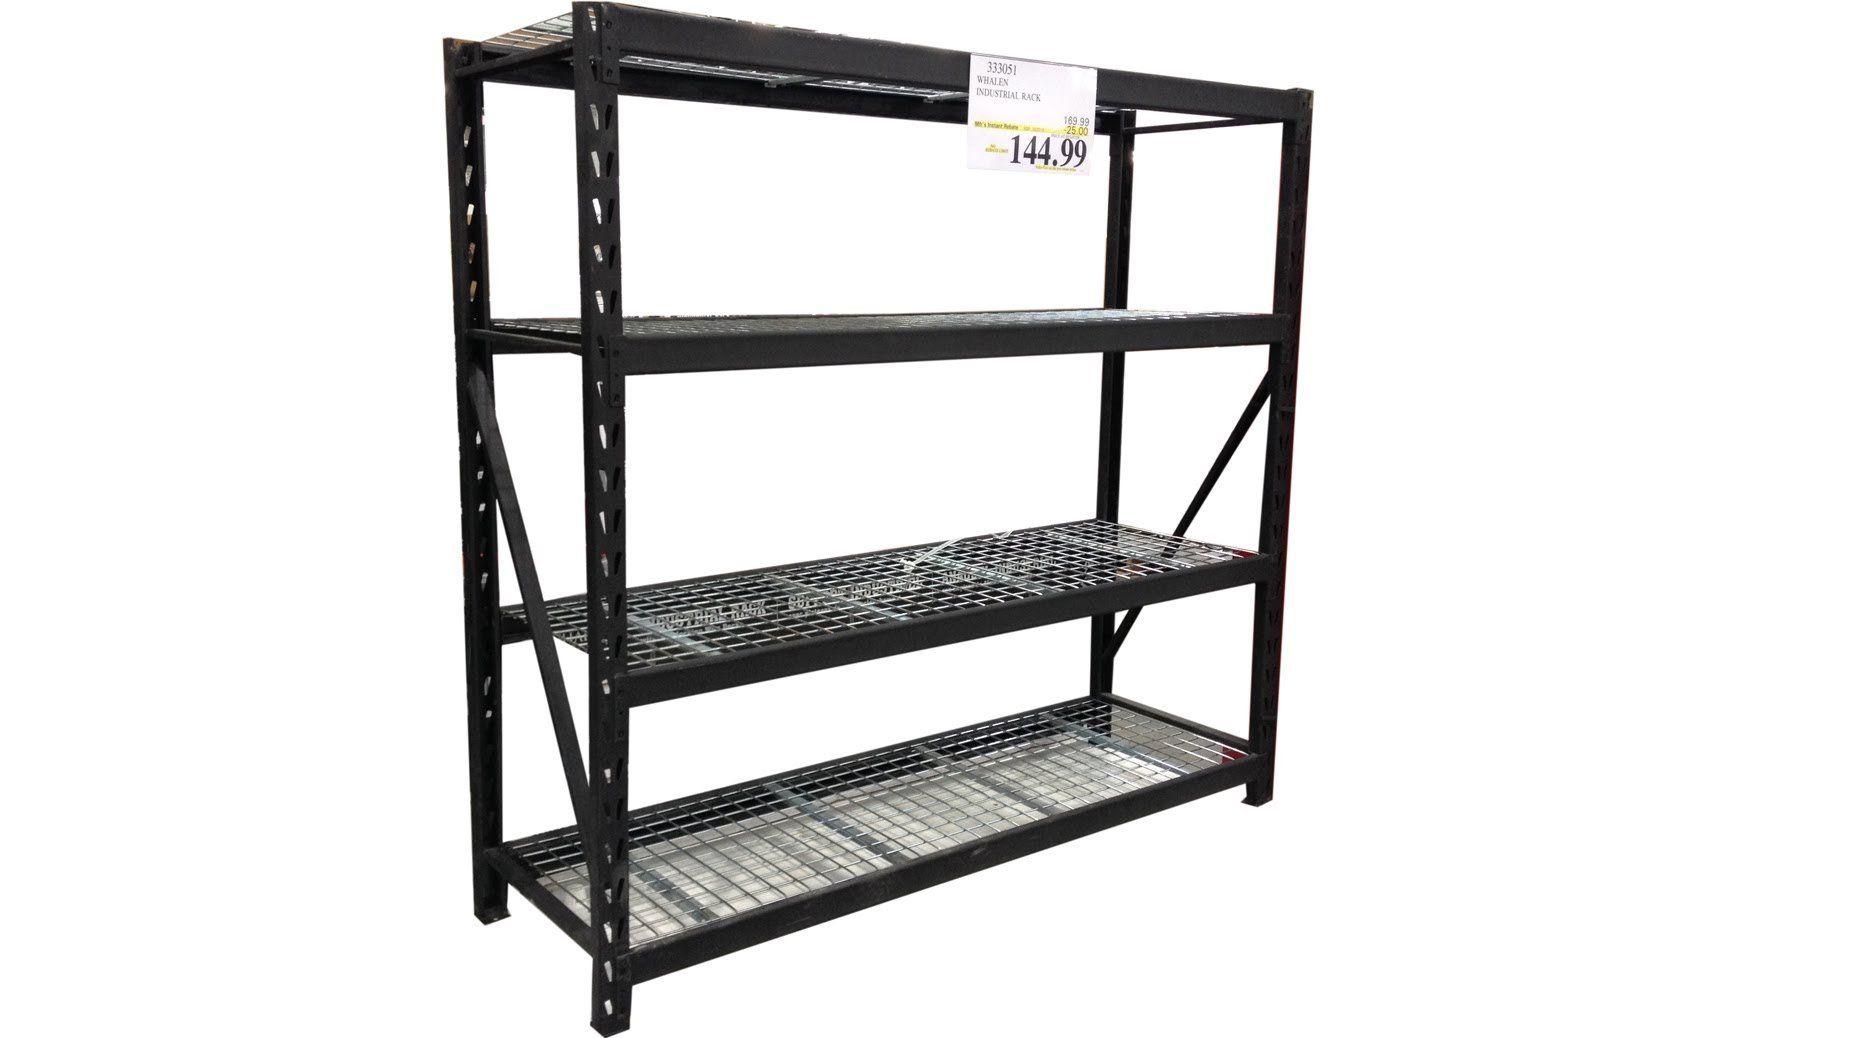 Costco Garage Shelves Http Undhimmi Com Costco Garage Shelves